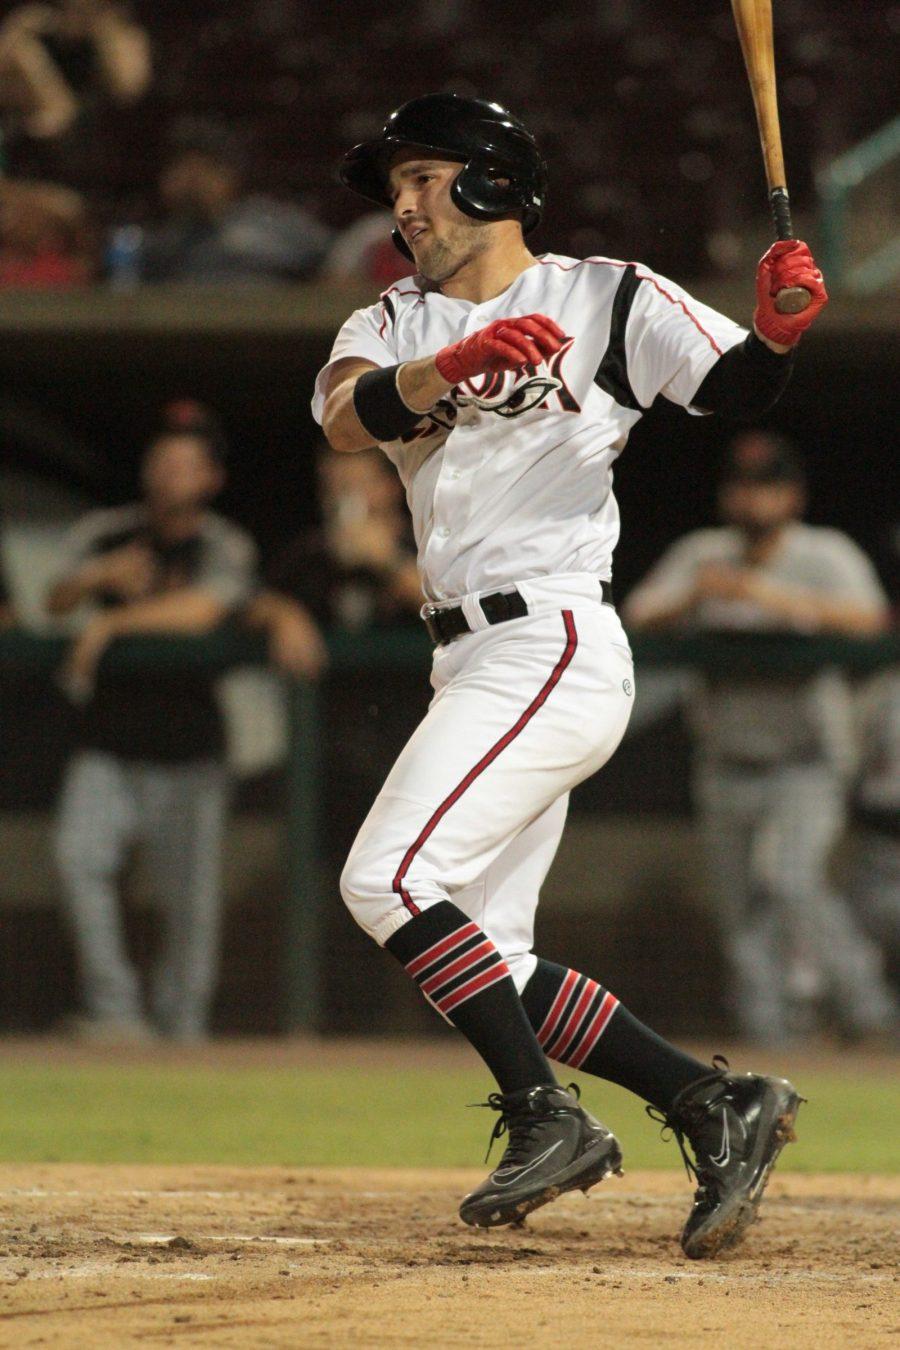 Luis Torrens, San Diego Padres prospect bats for Lake Elsinore Storm